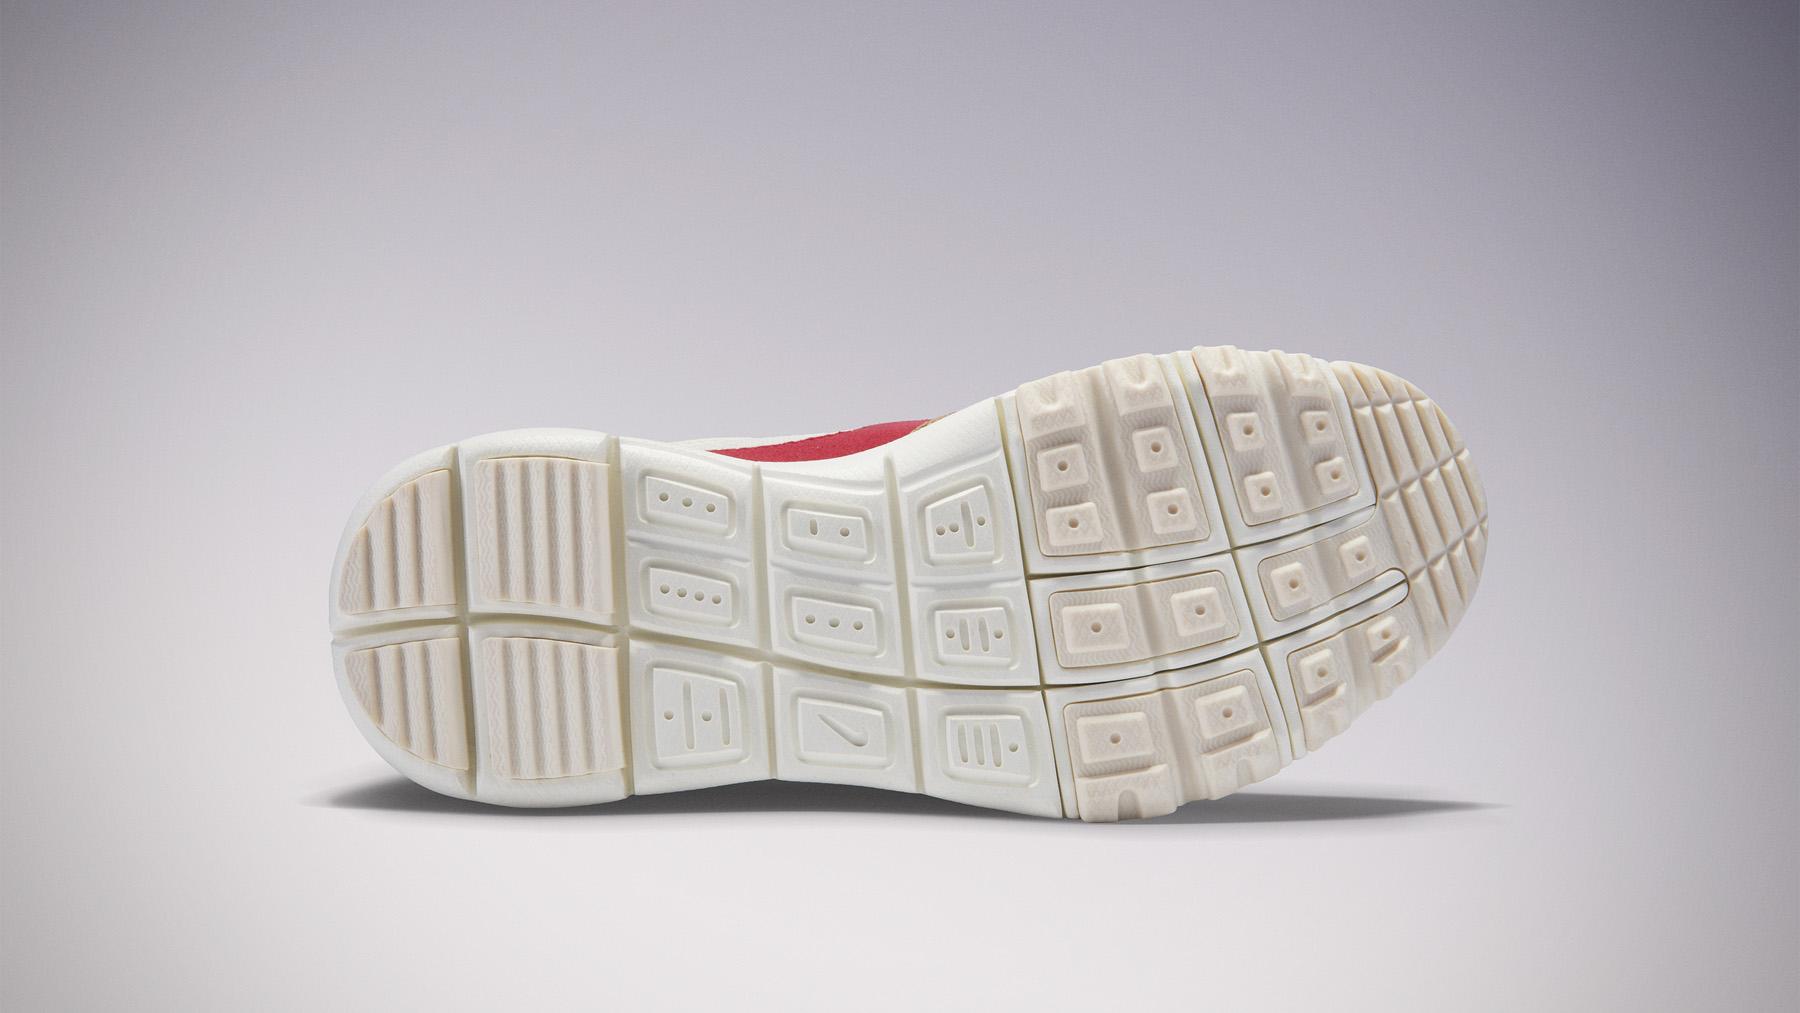 mars-yard-shoe-2